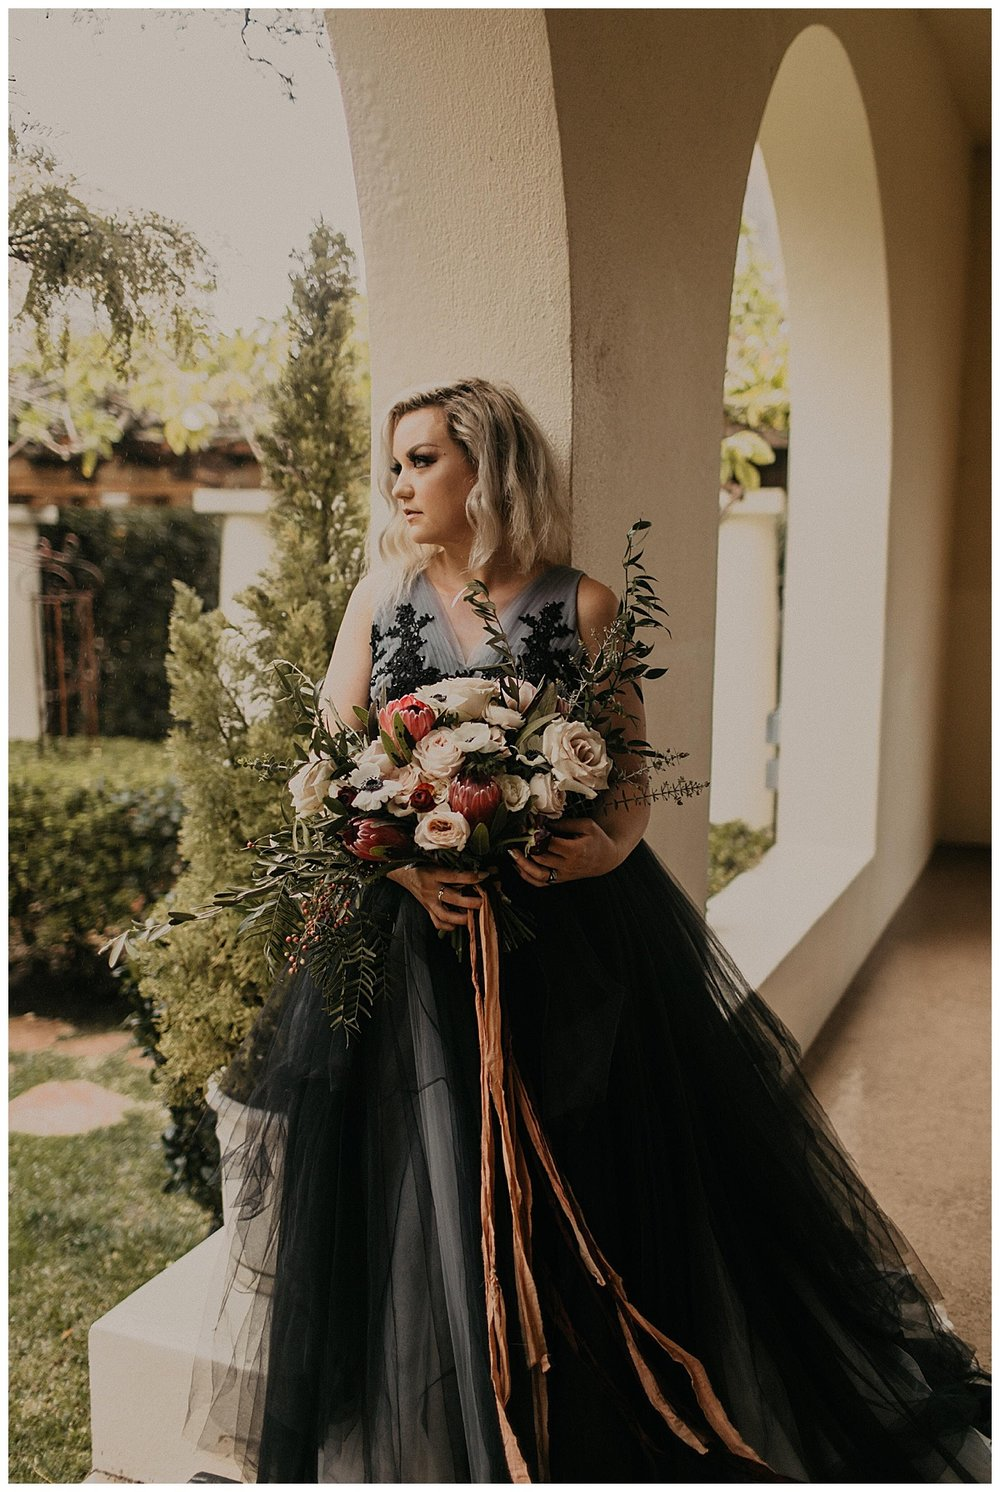 Bixby+Pine-Samantha-McFarlen-La-Jolla-Womens-Club-La-Jolla-California-Rogue-Styling_0004.jpg